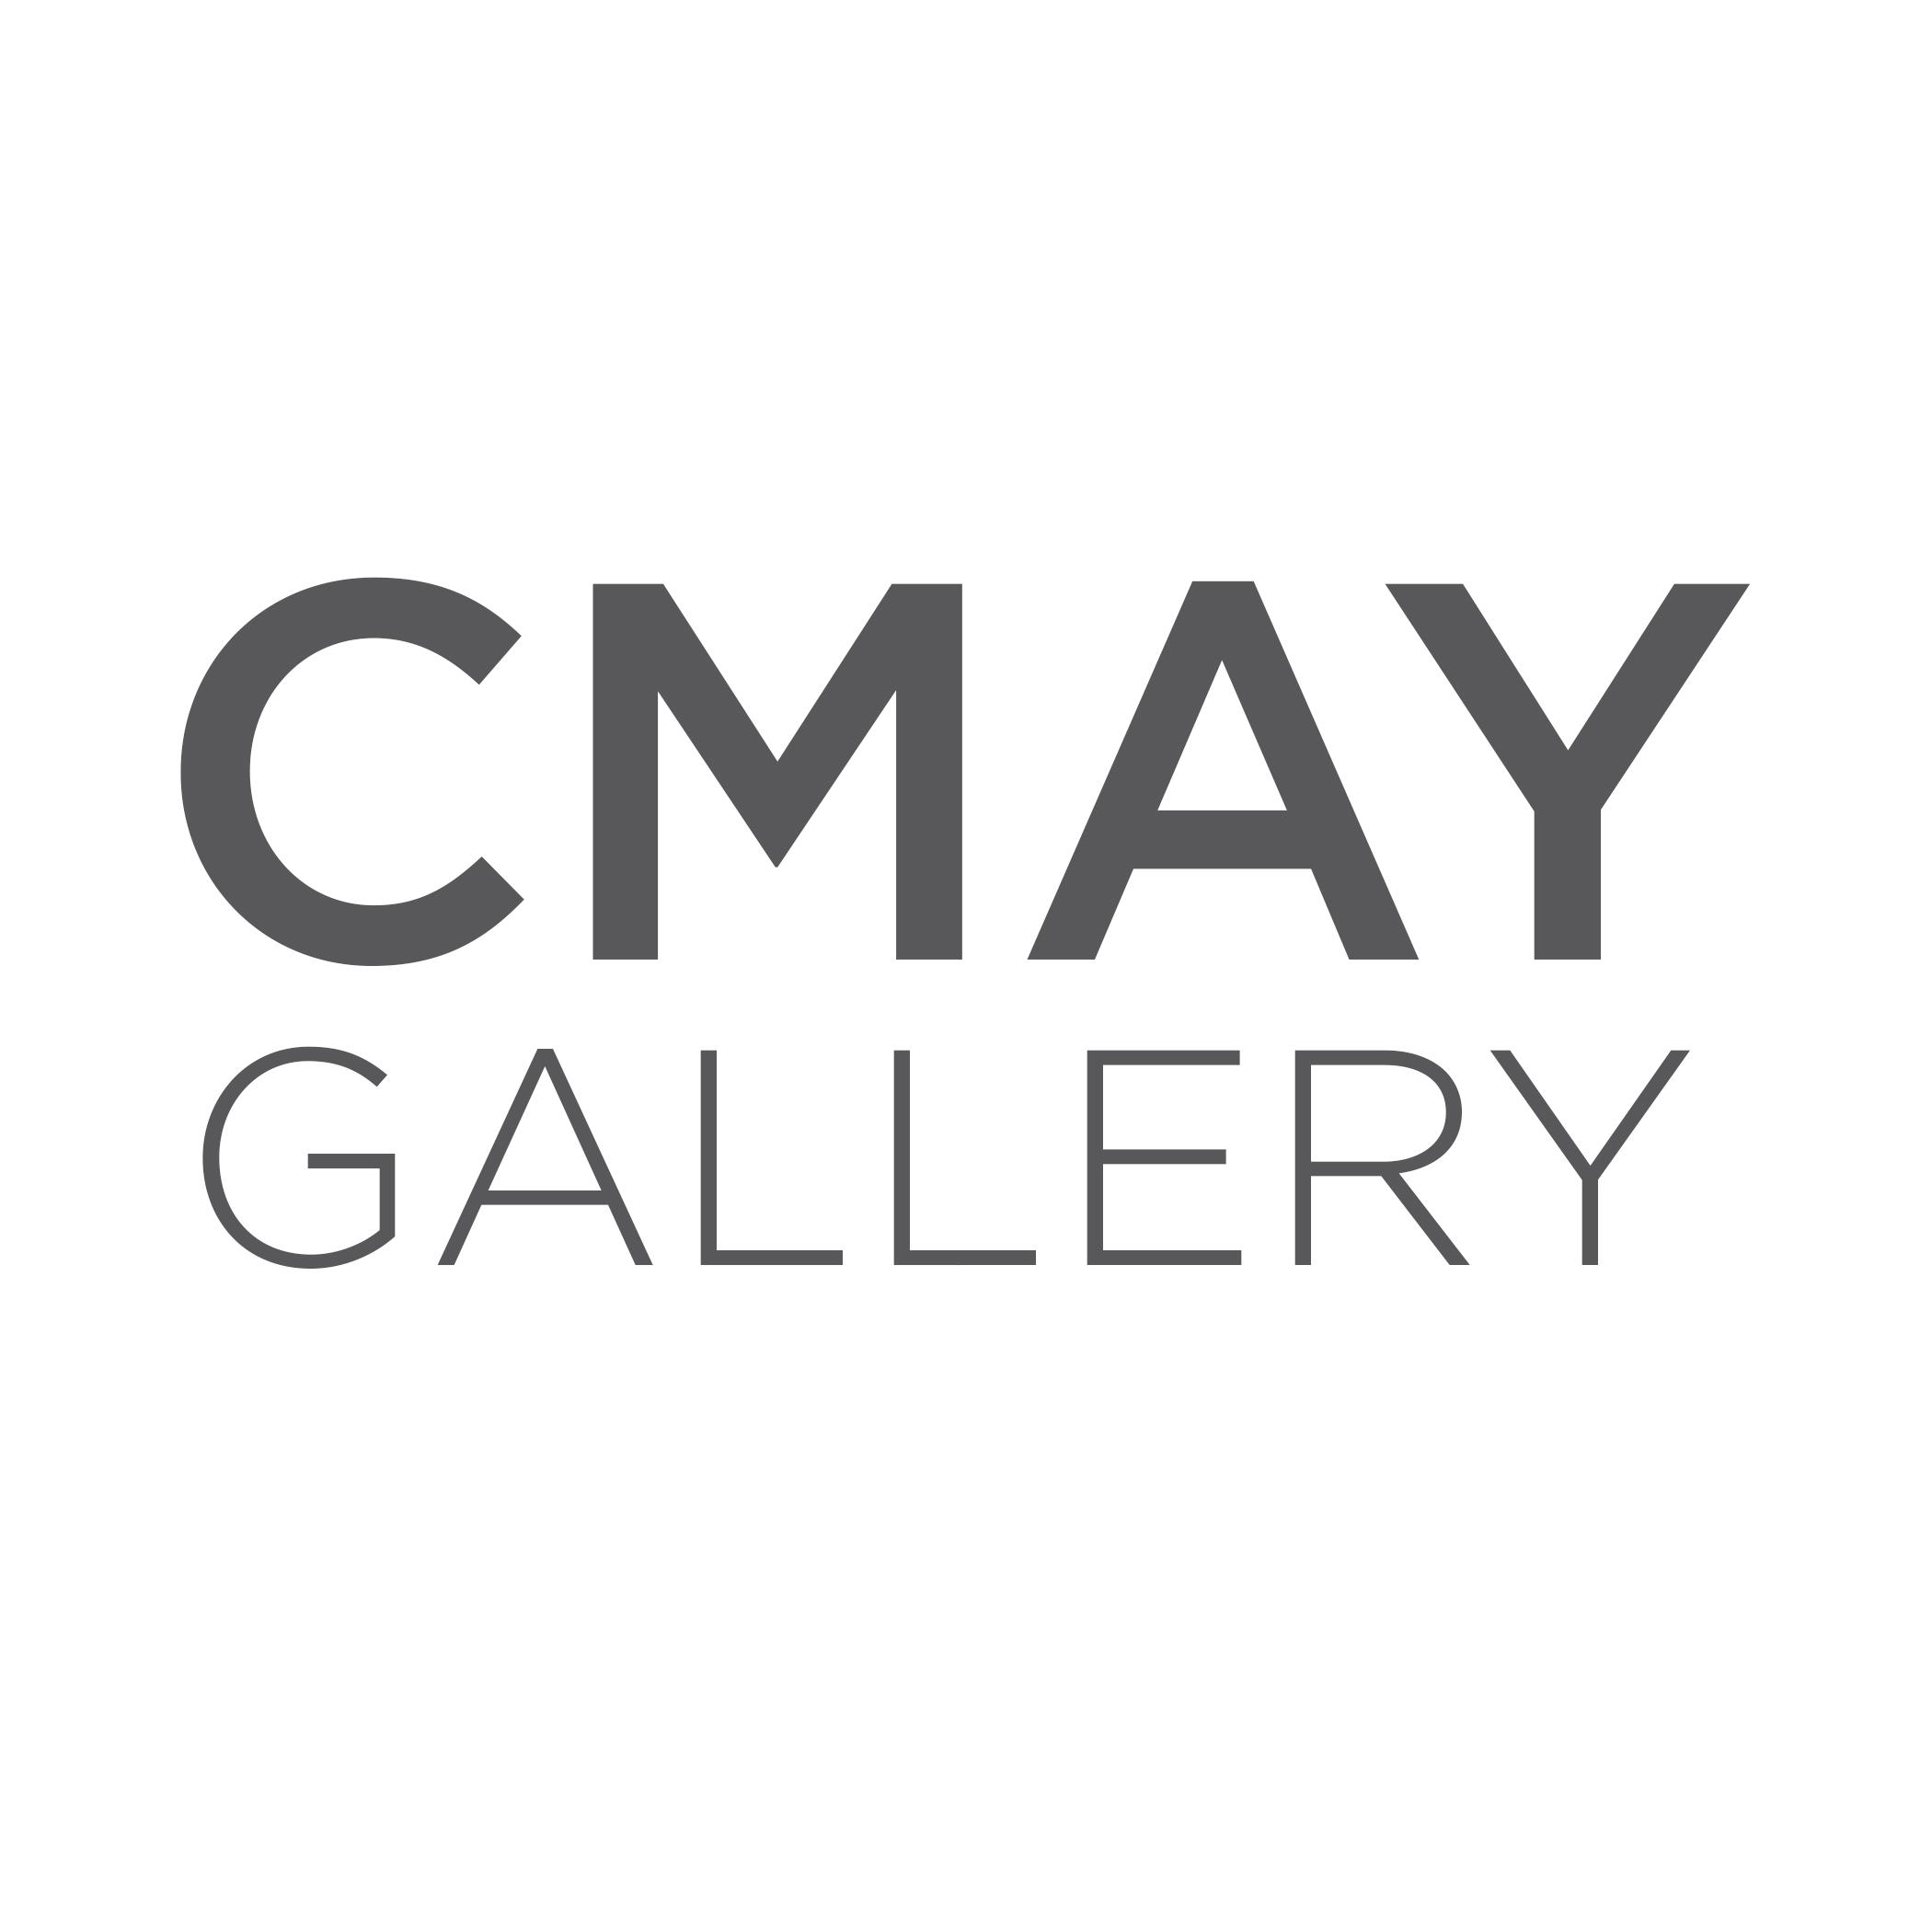 CMay Gallery